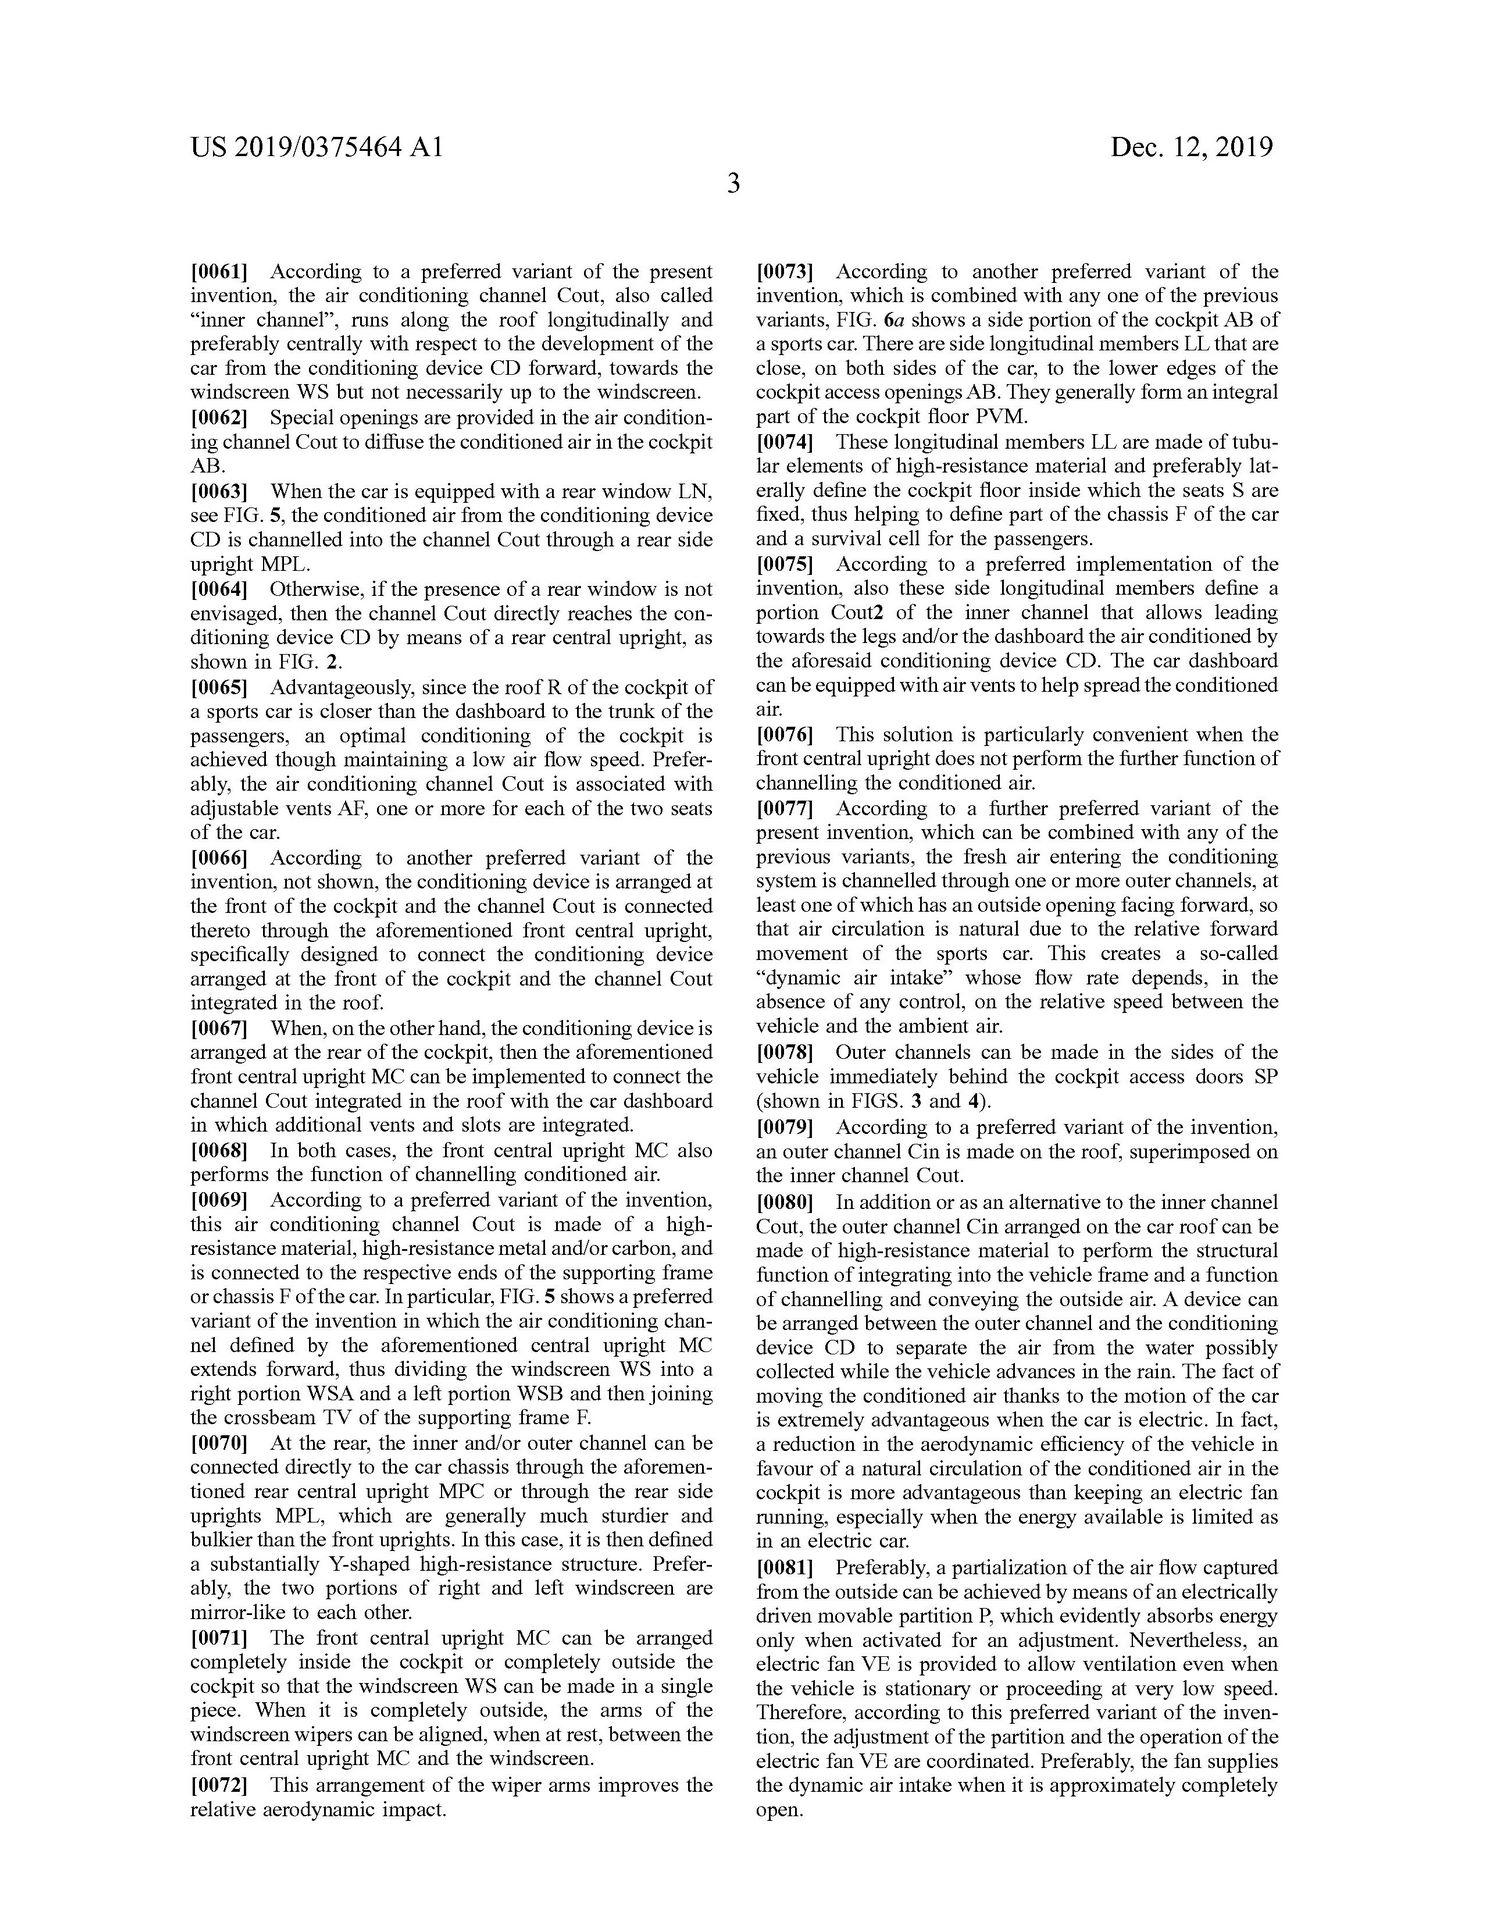 Ferrari-Halo-Cockpit-Pillar-Patent-11